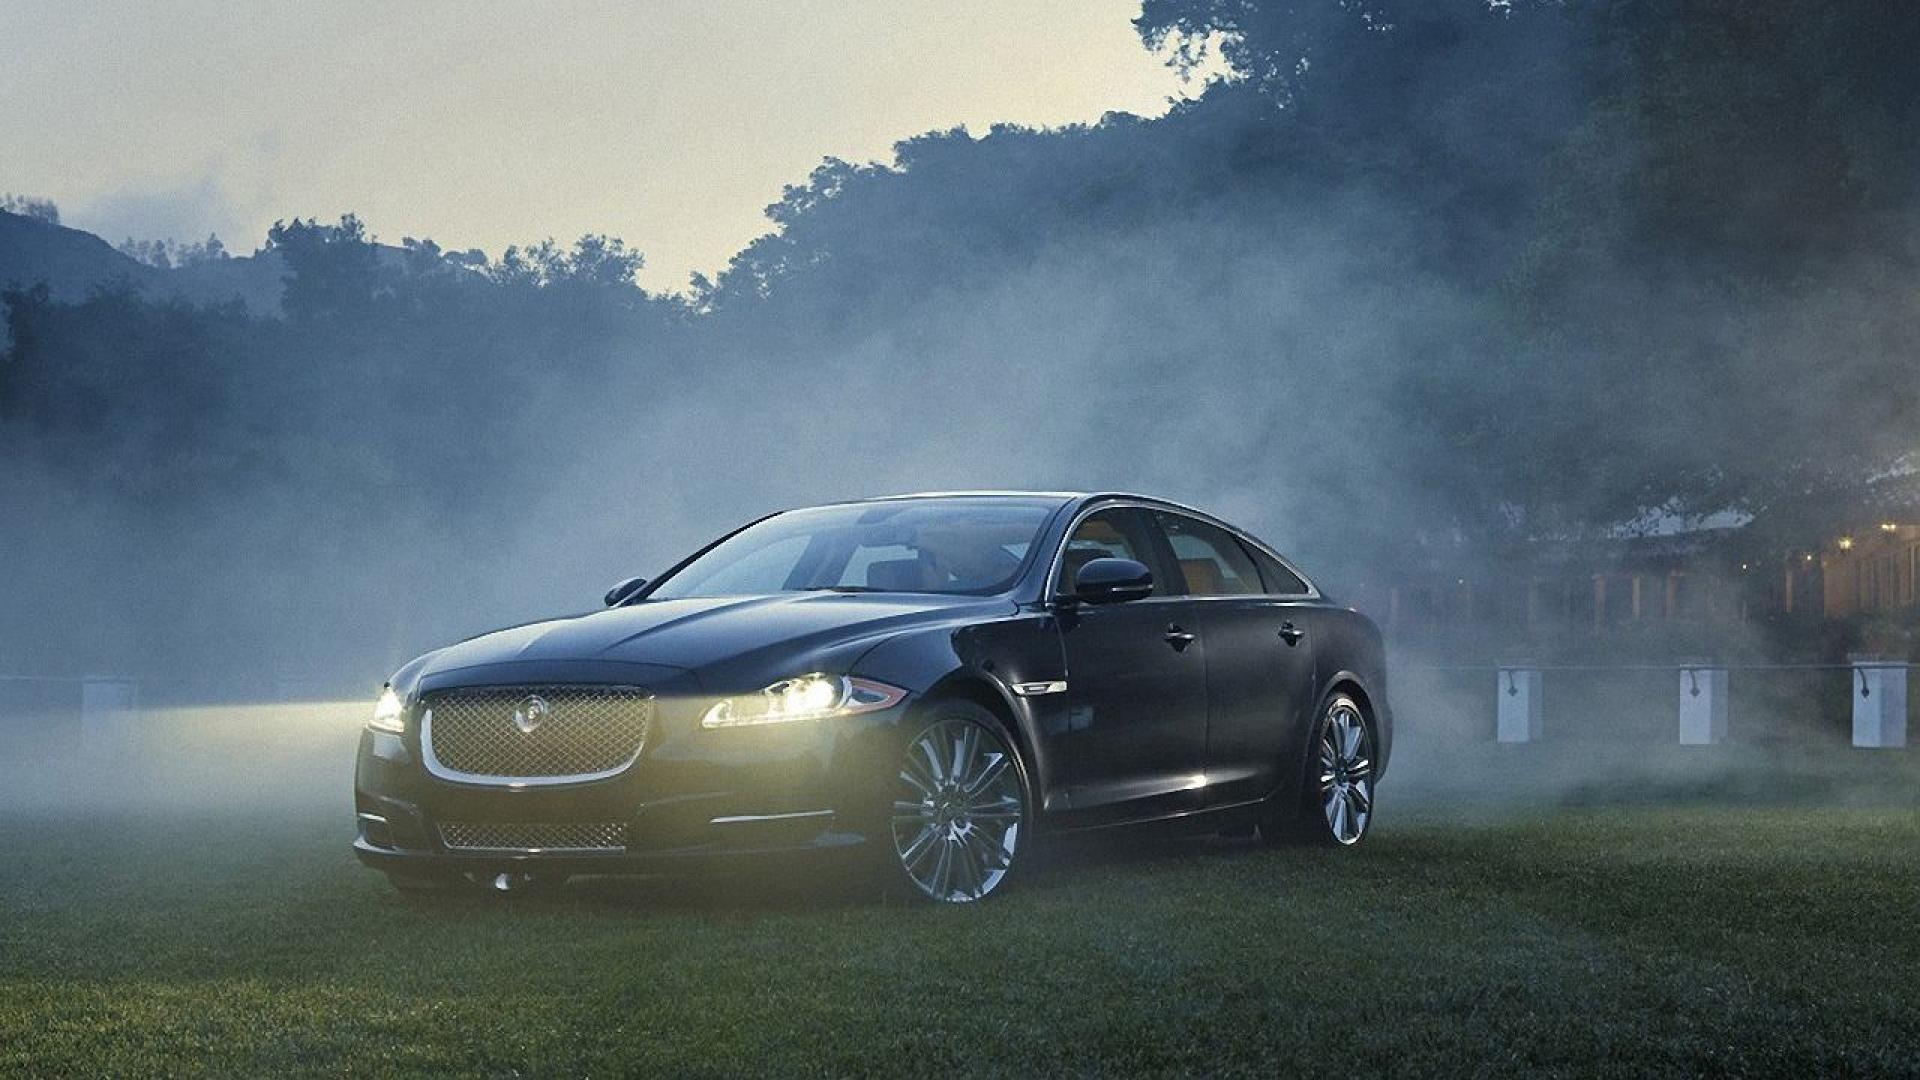 The auto editors of consumer guide jaguar cars evoke sensuous styling, snar. Jaguar Xj Wallpapers Wallpaper Cave